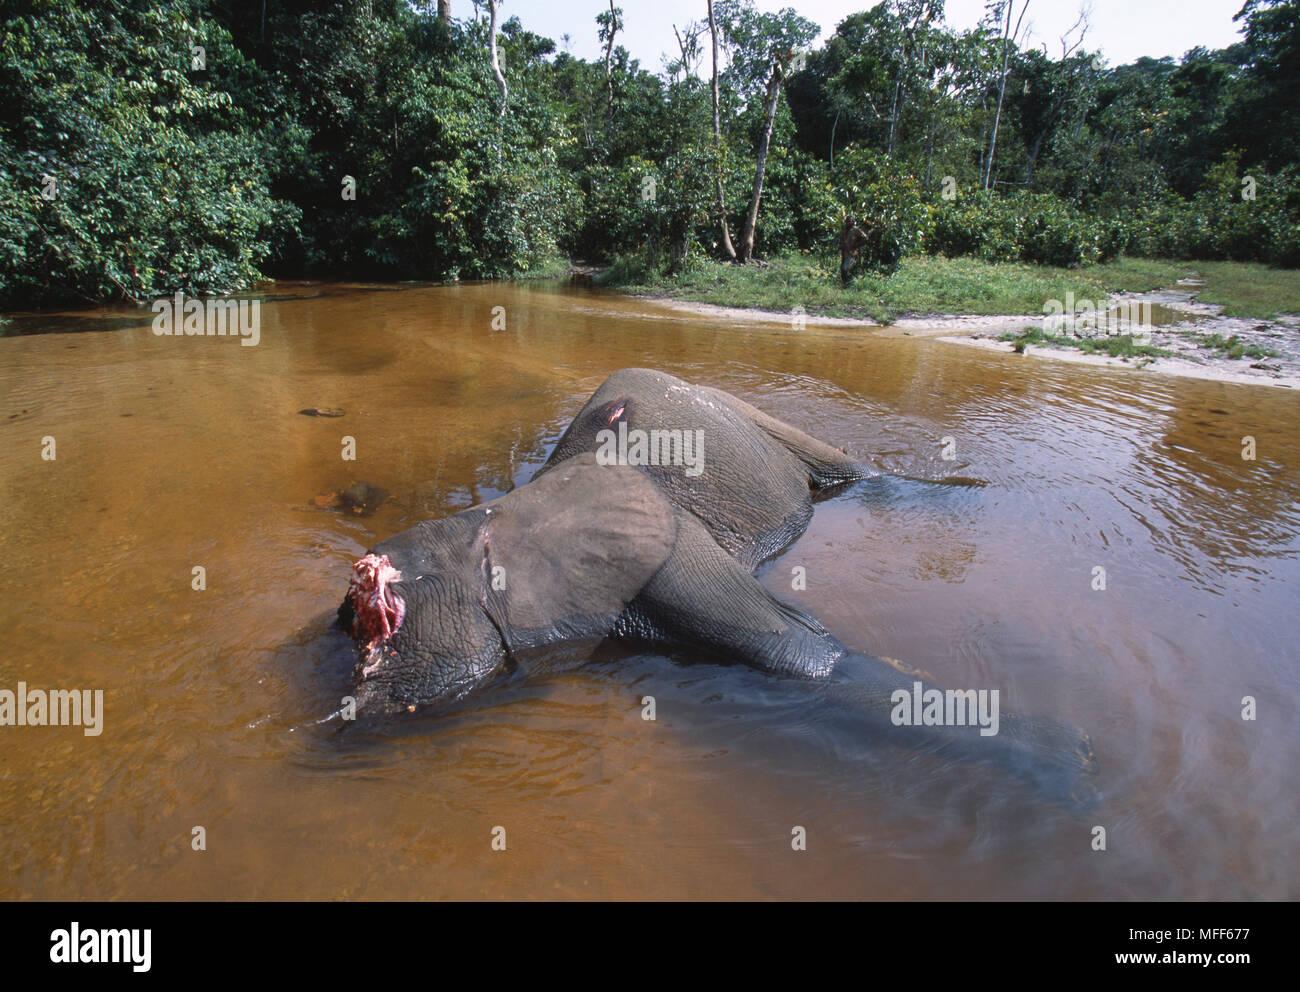 AFRICAN FOREST ELEPHANT Loxodonta africana cyclotis killed by poachers for tusks Dzanga- Ndoki Natl Pk, Central African Republic - Stock Image